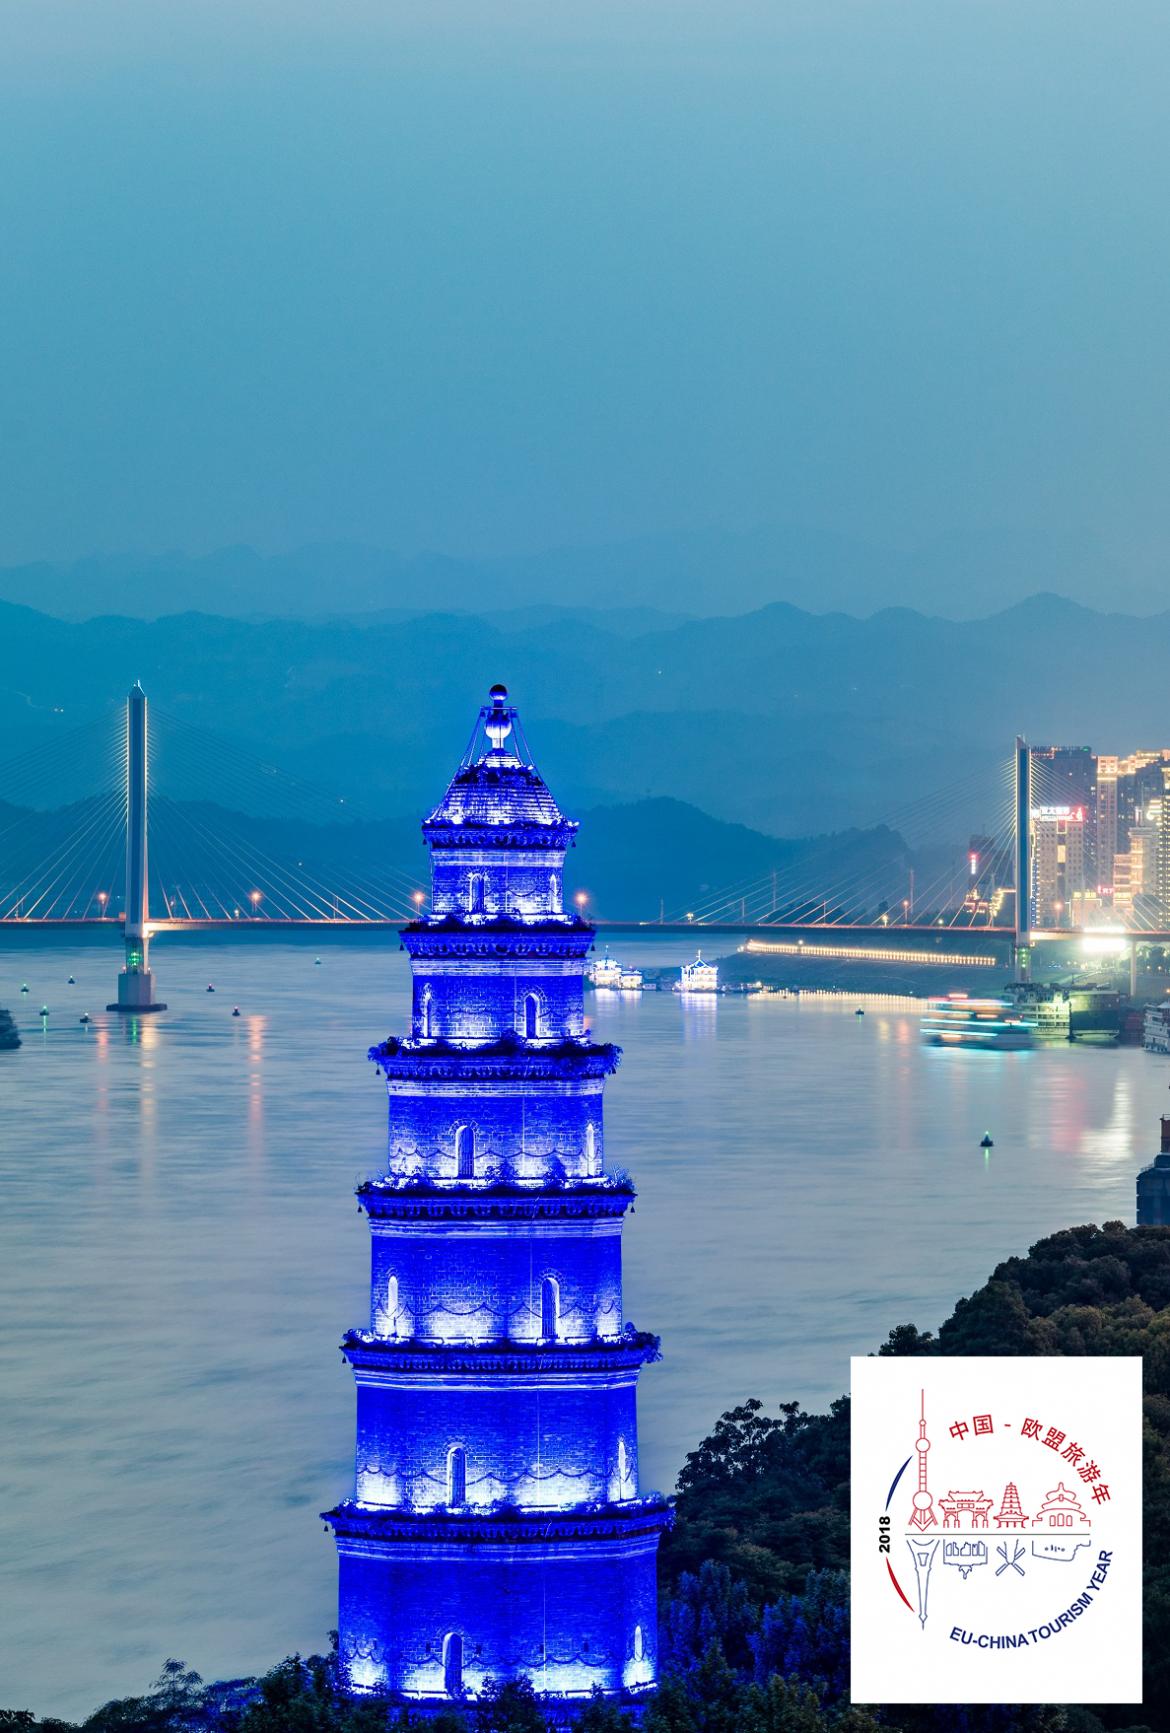 tianran-tower-yichang.png